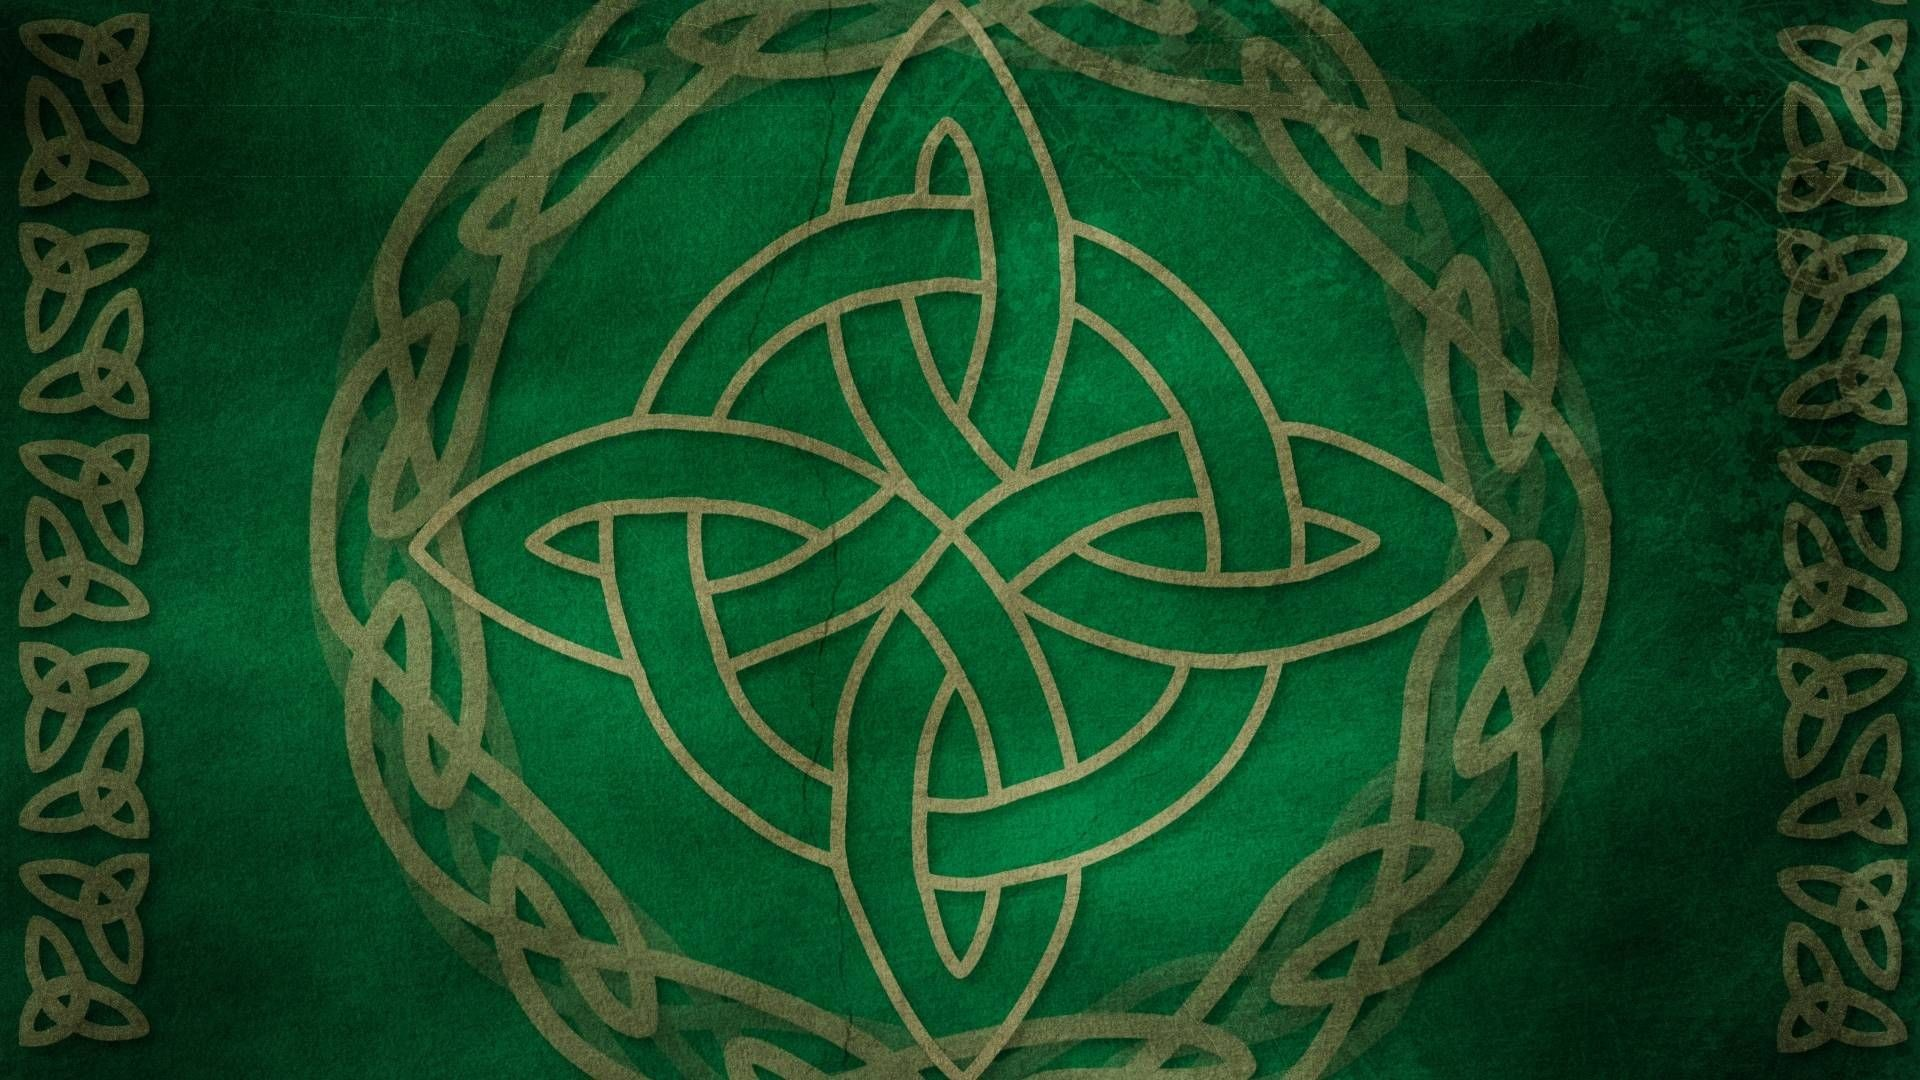 Res: 1920x1080, Irish Wallpaper Backgrounds Wallpaper 1920×1080 Free Irish Wallpapers (40  Wallpapers) | Adorable